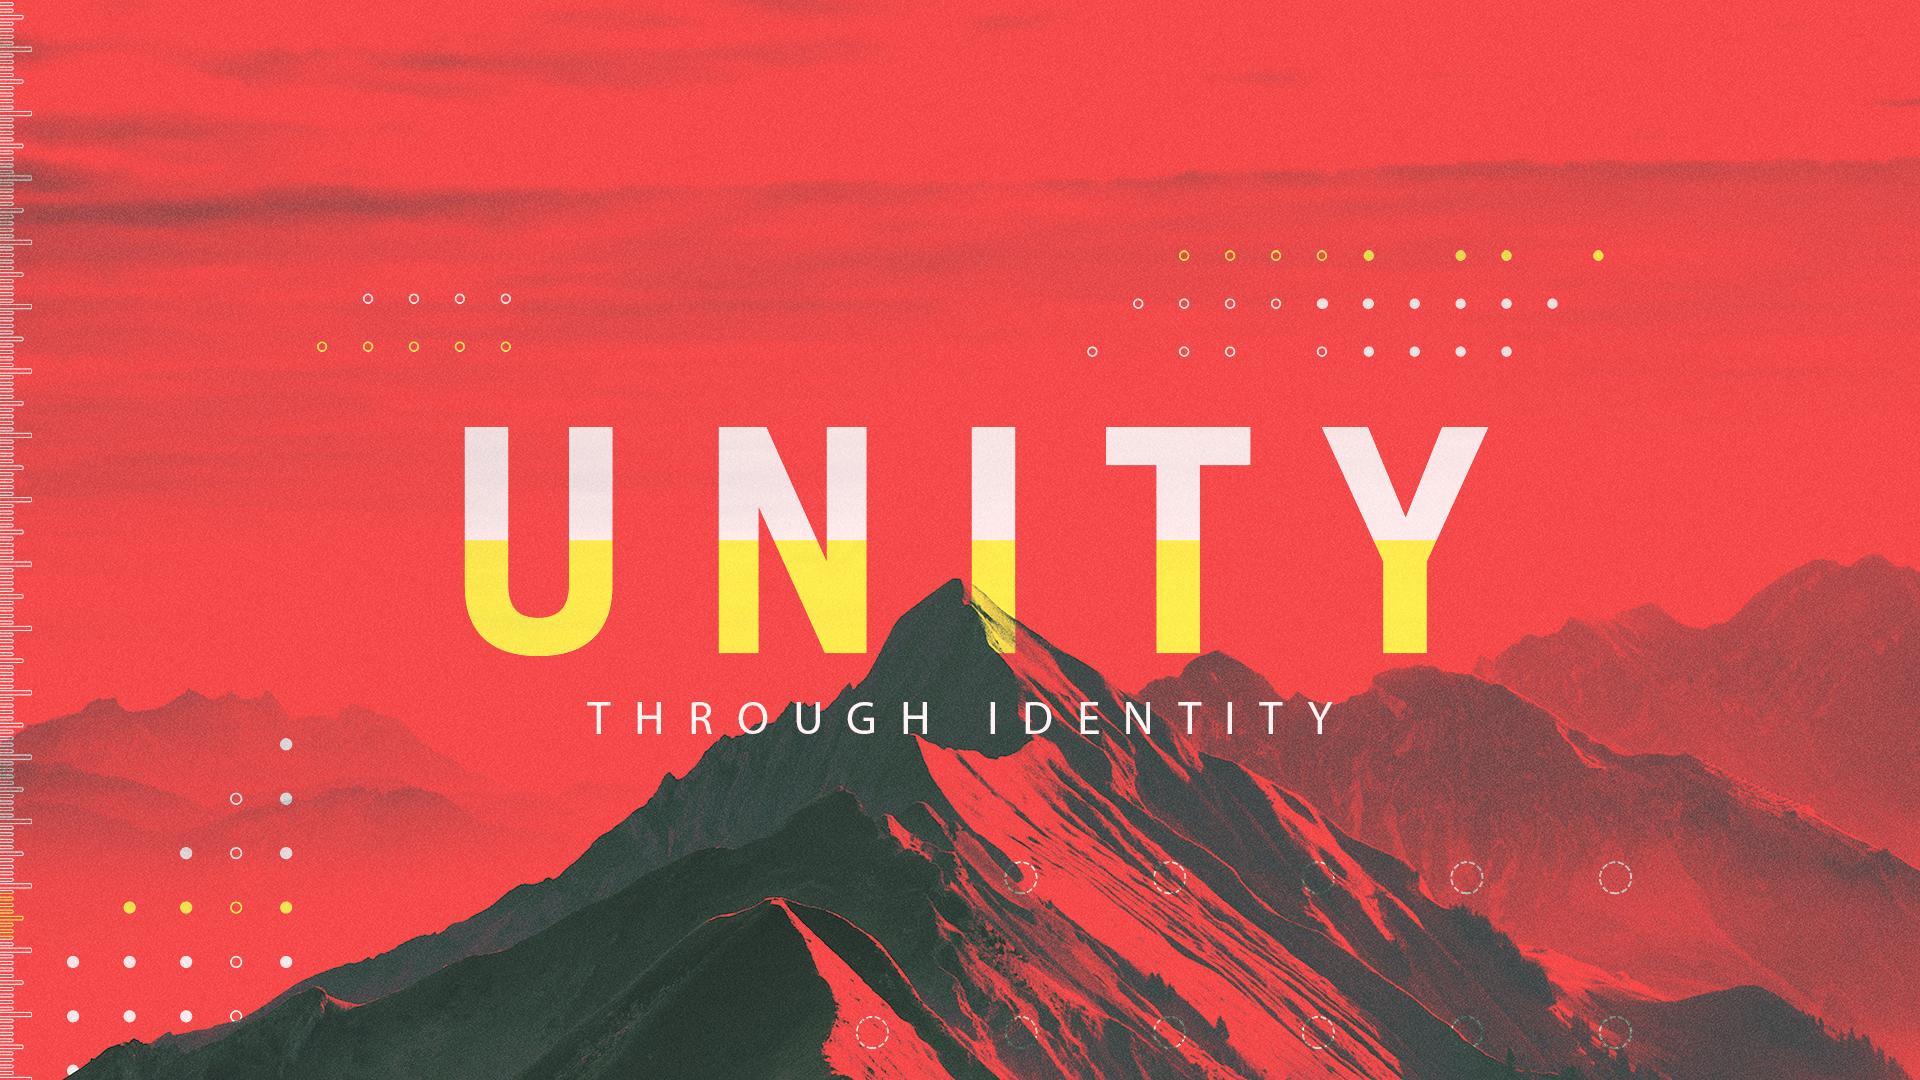 Unity Through Identity